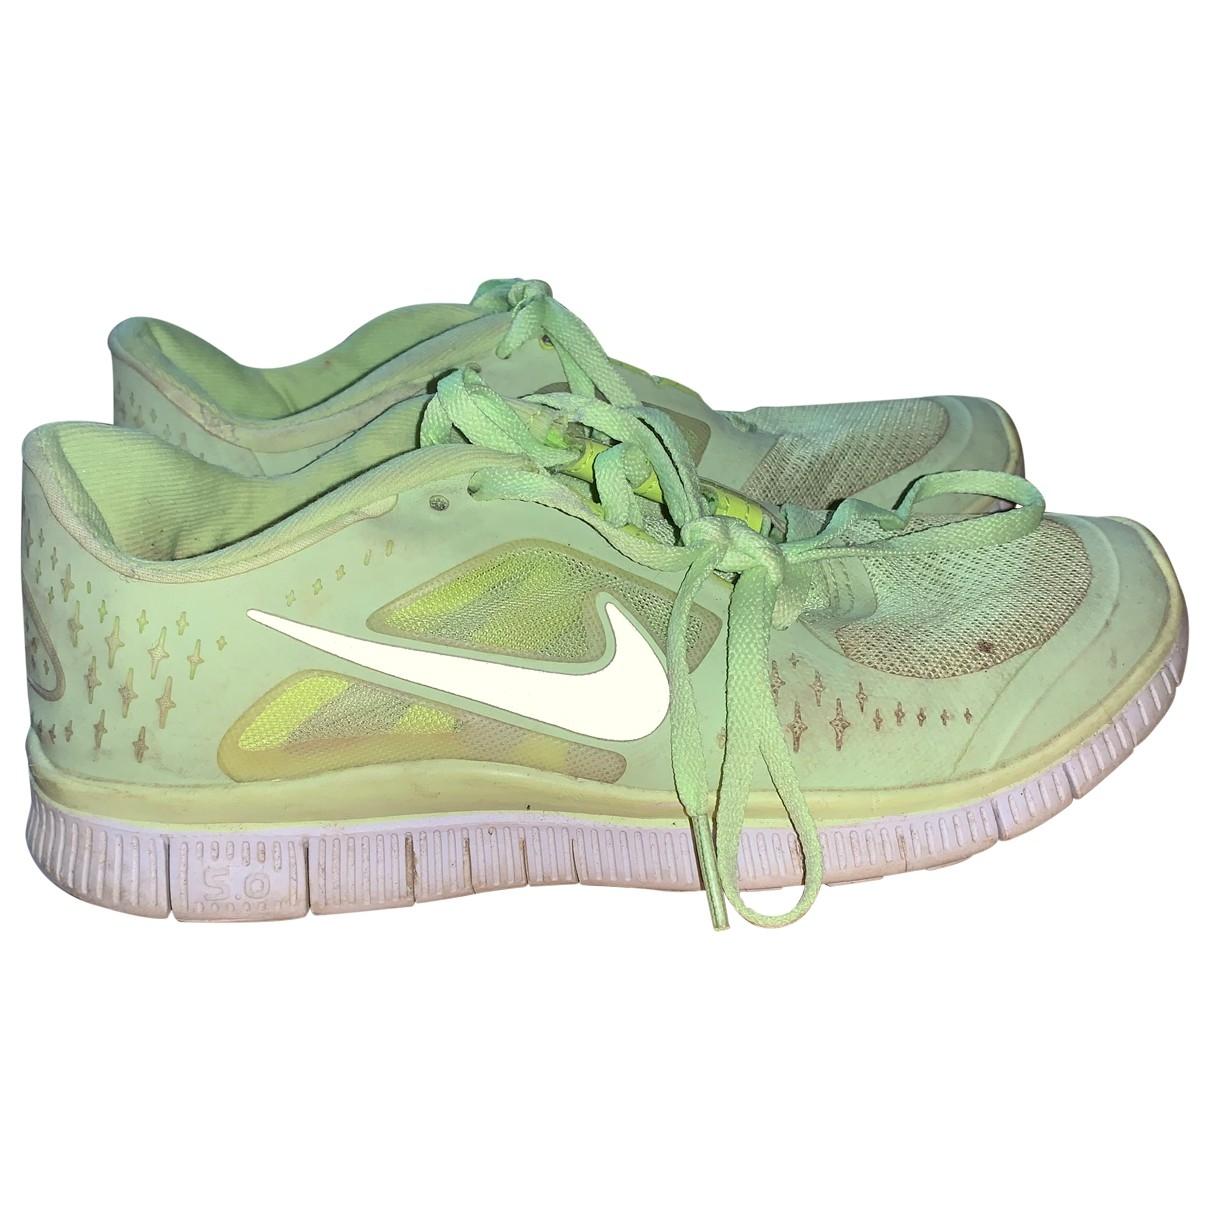 Nike Free Run Sneakers in  Gruen Kautschuk